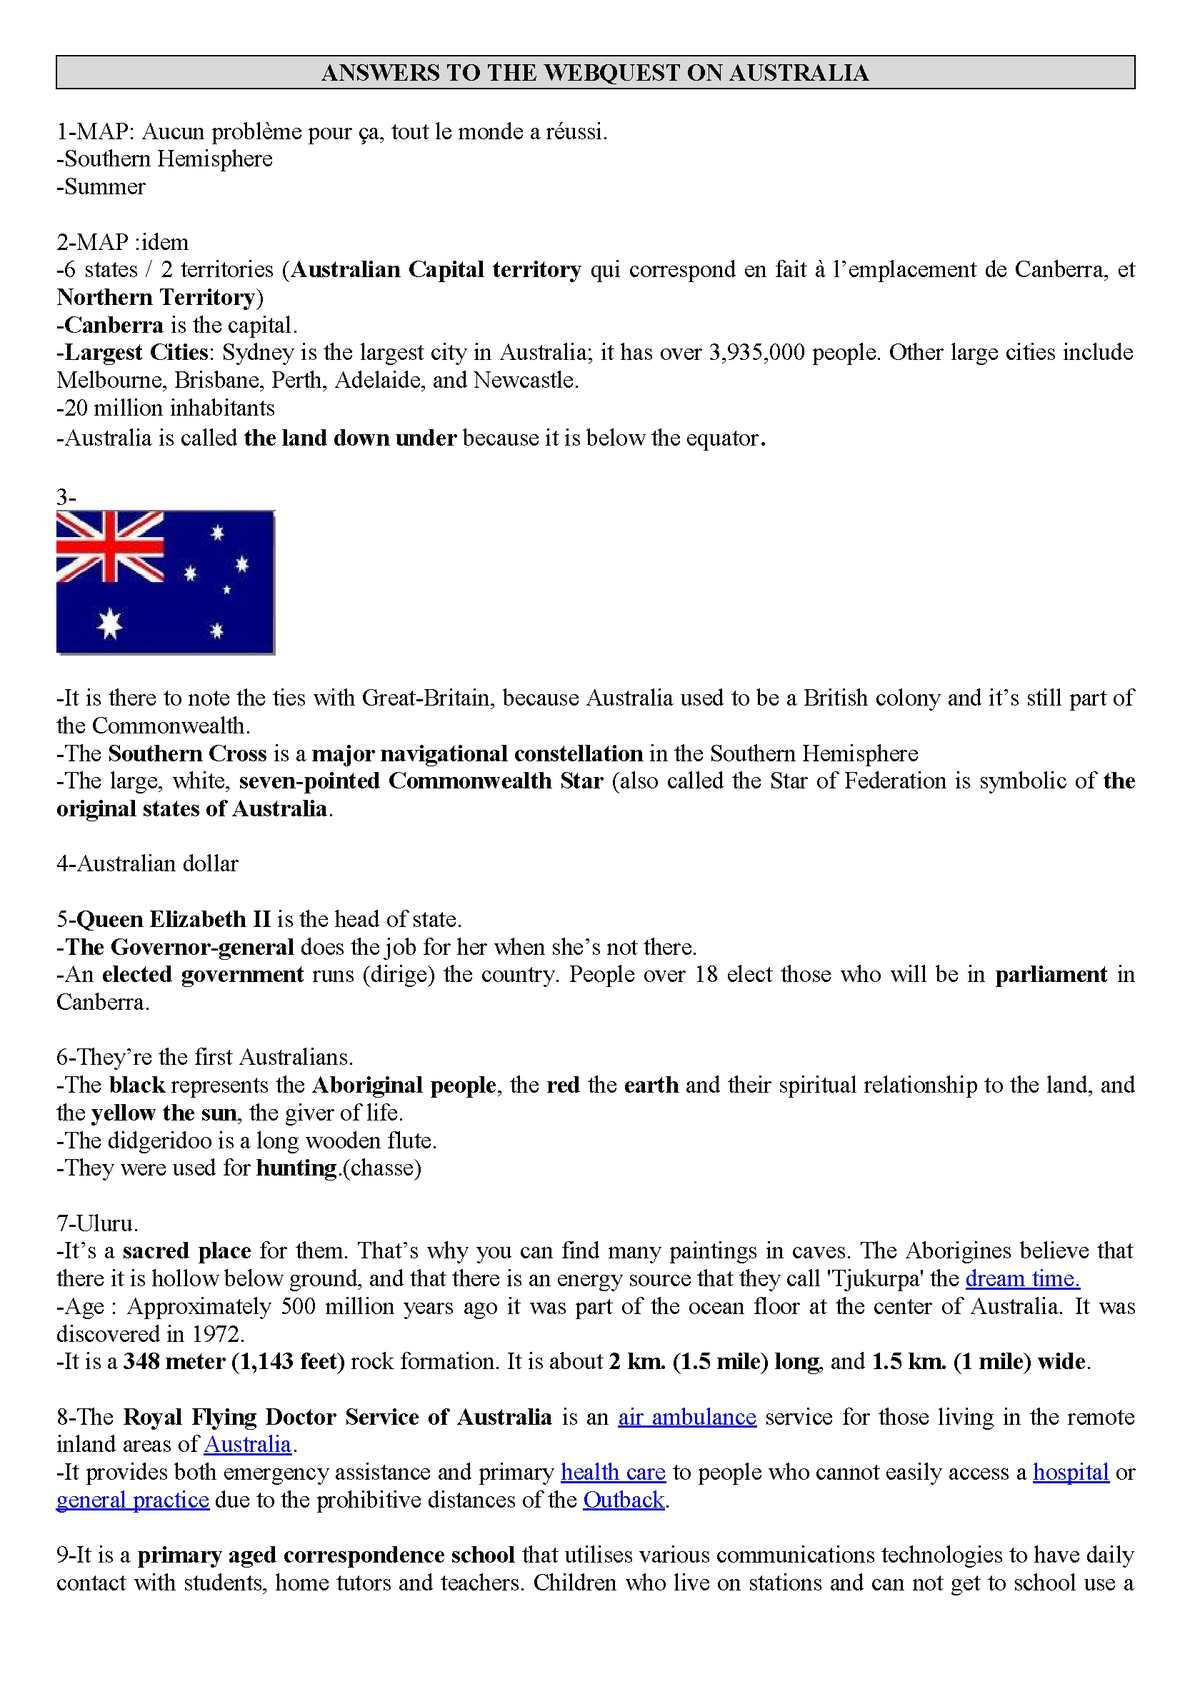 Australia Map 6 States.Calameo Australia Webquest Answers